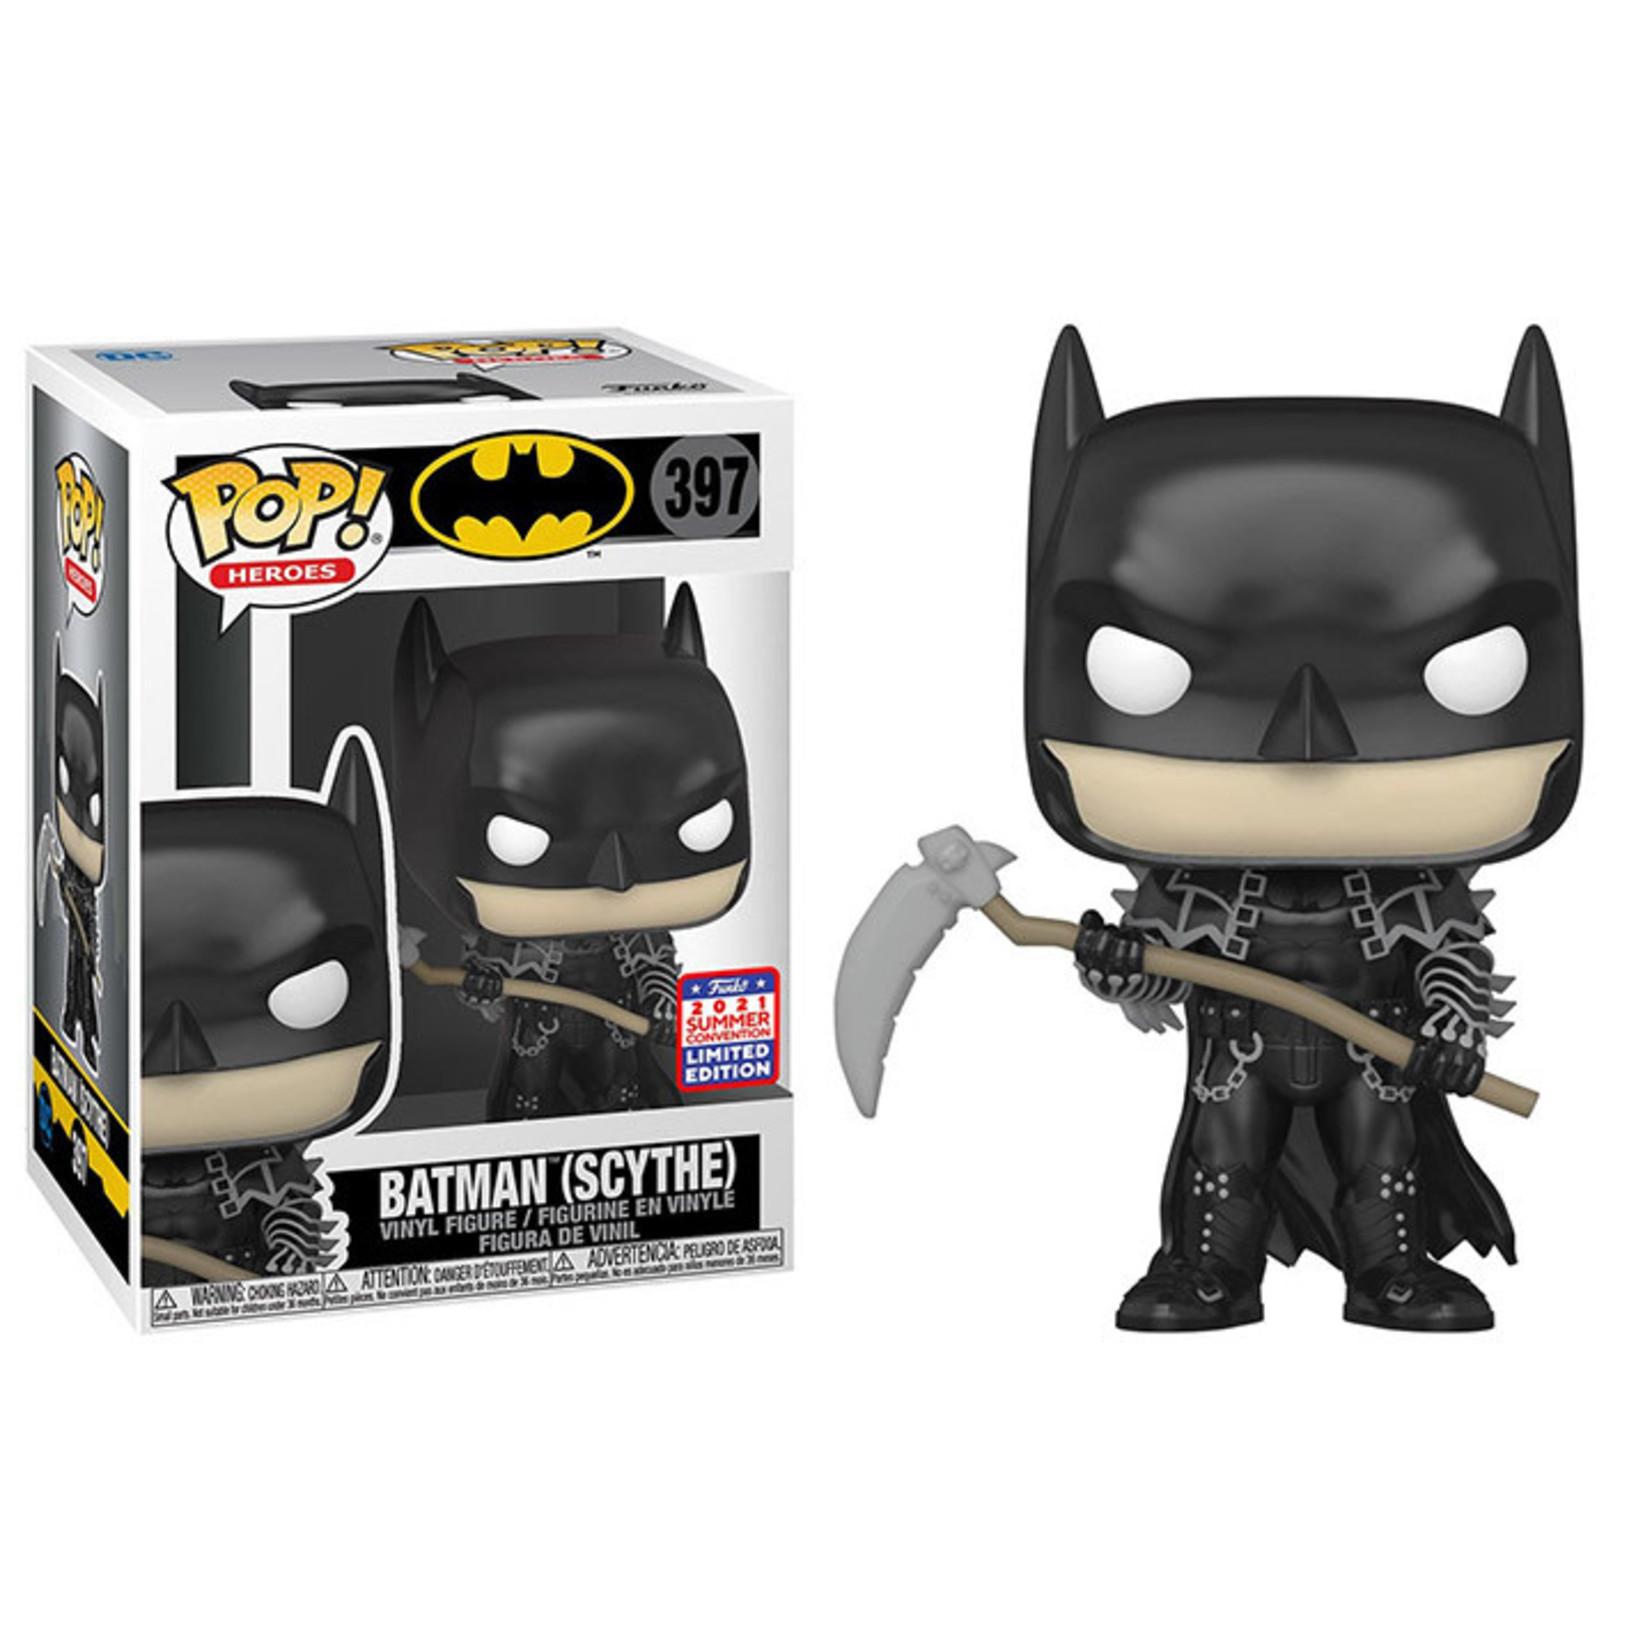 Funko Batman with Scythe Pop Vinyl Figure - 2021 Convention Exclusive